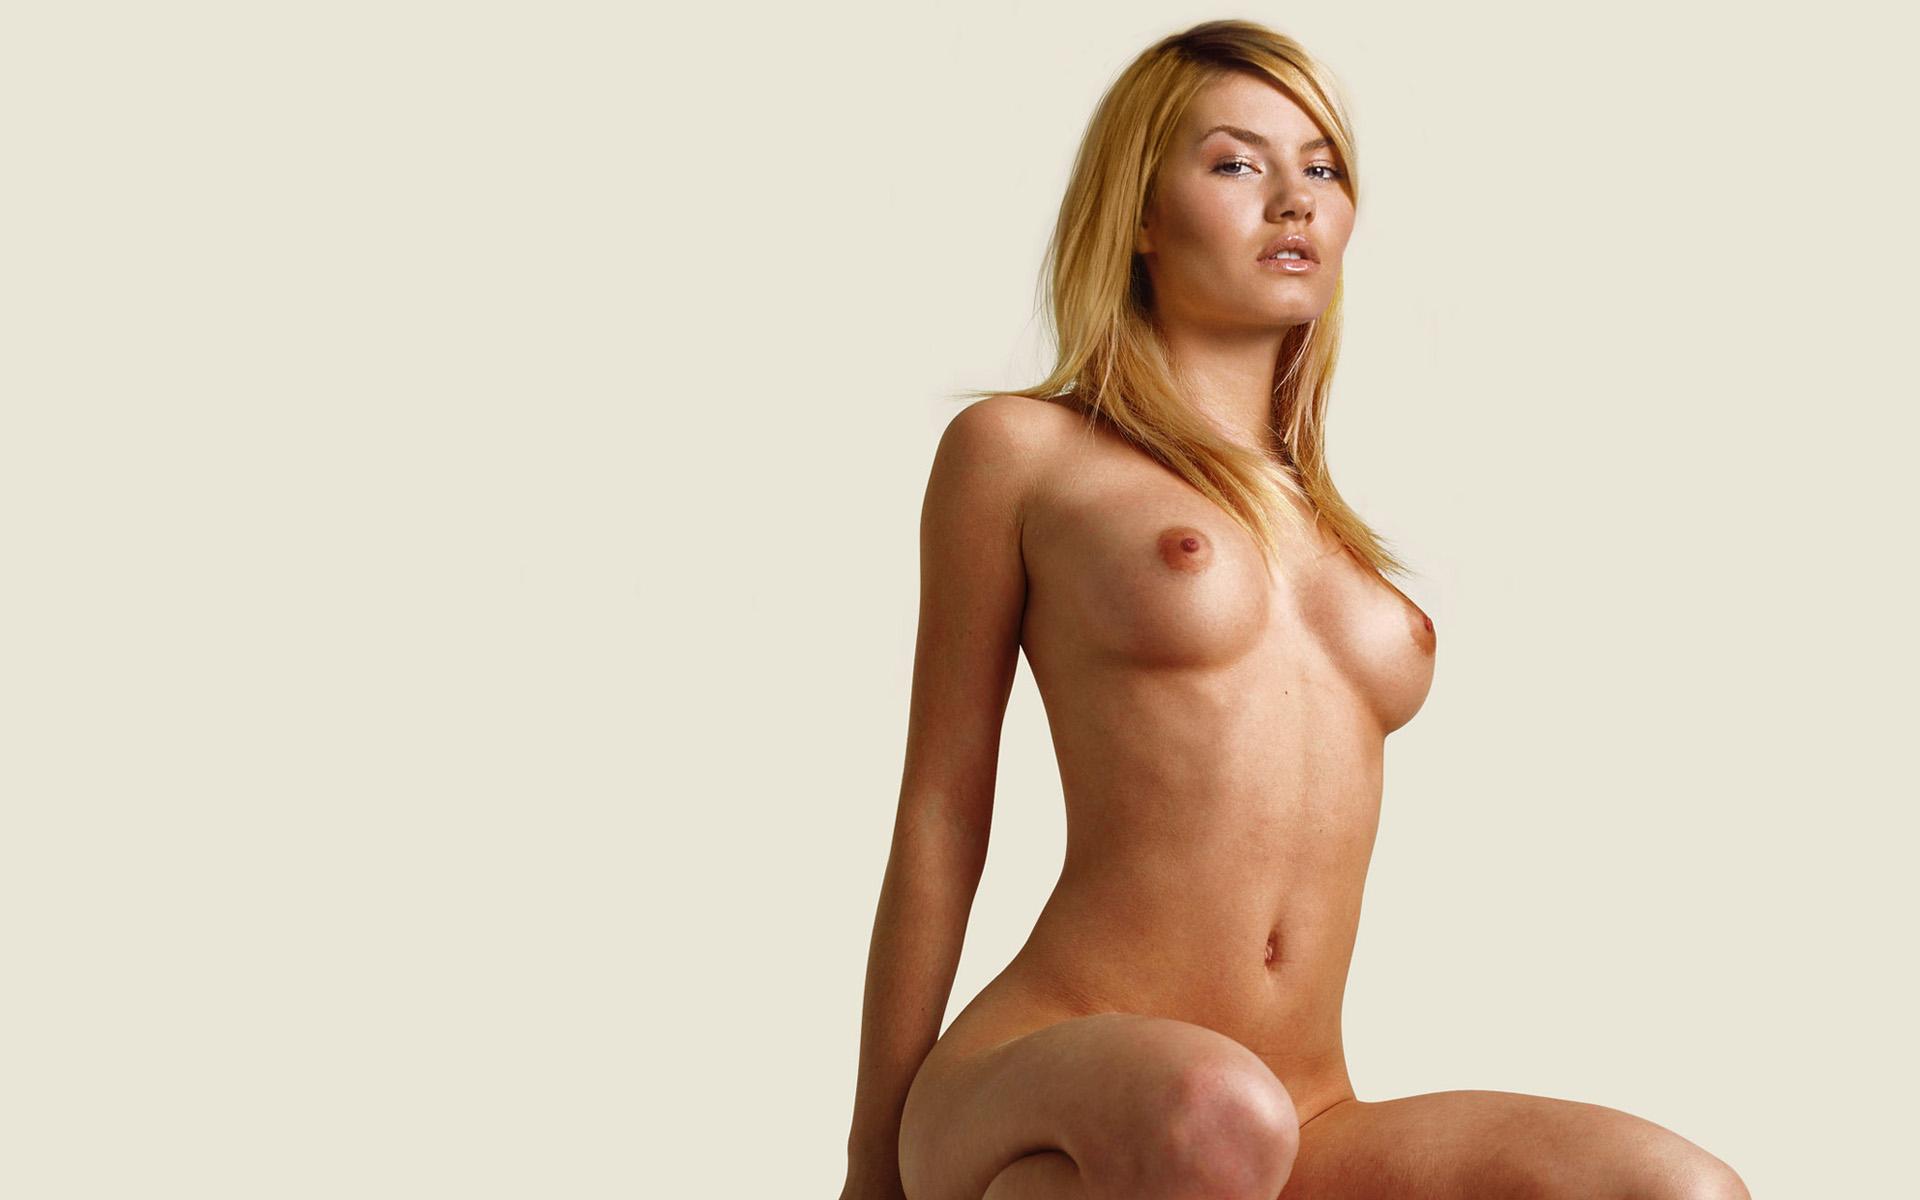 Fake elisha cuthbert nude pics